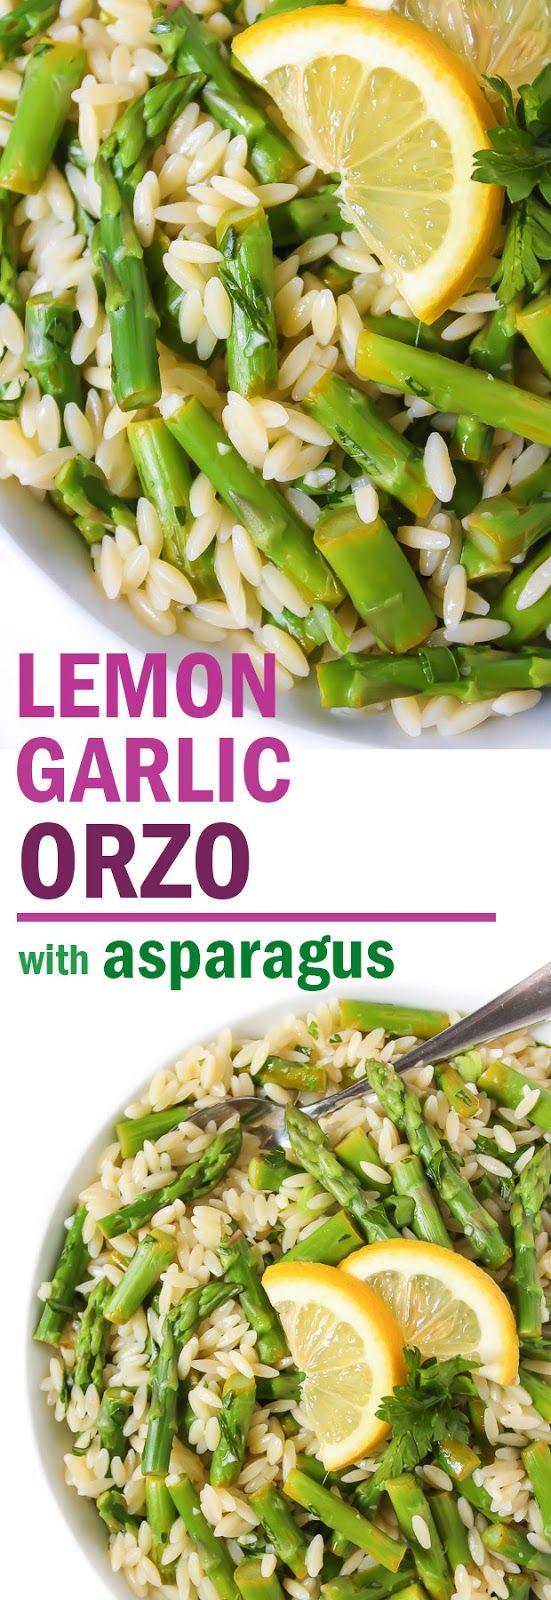 Lemon Garlic Orzo with Asparagus